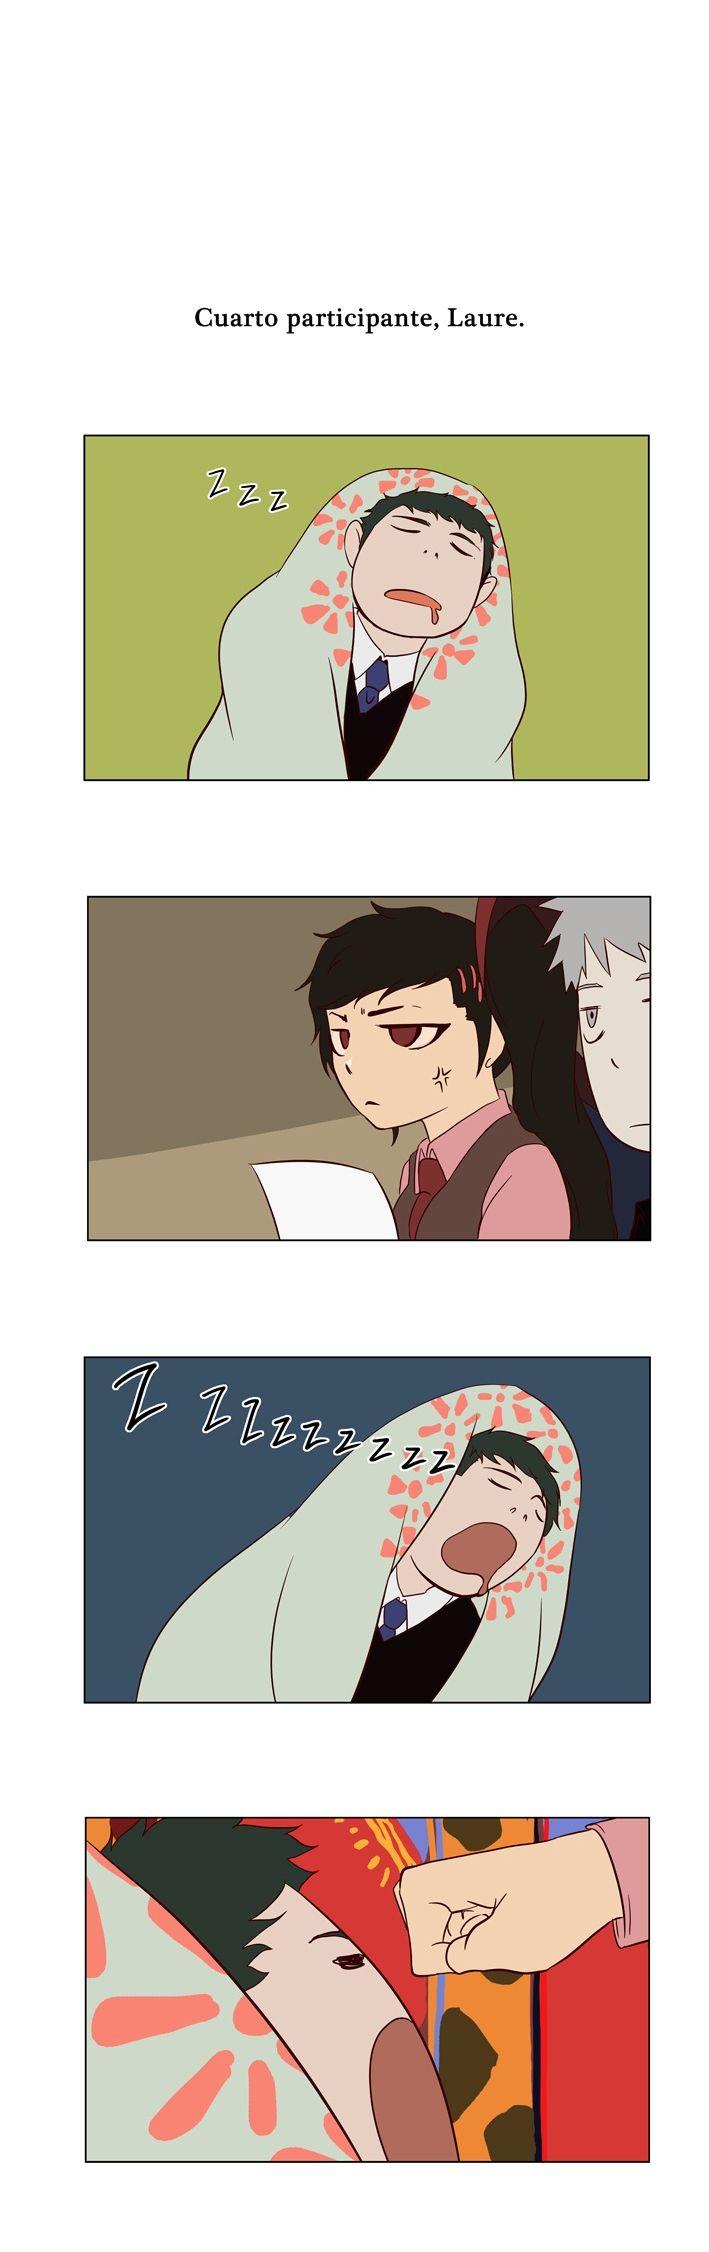 http://c5.ninemanga.com/es_manga/21/149/482911/8de0c3085da54b8e957220b9c8de8aca.jpg Page 6